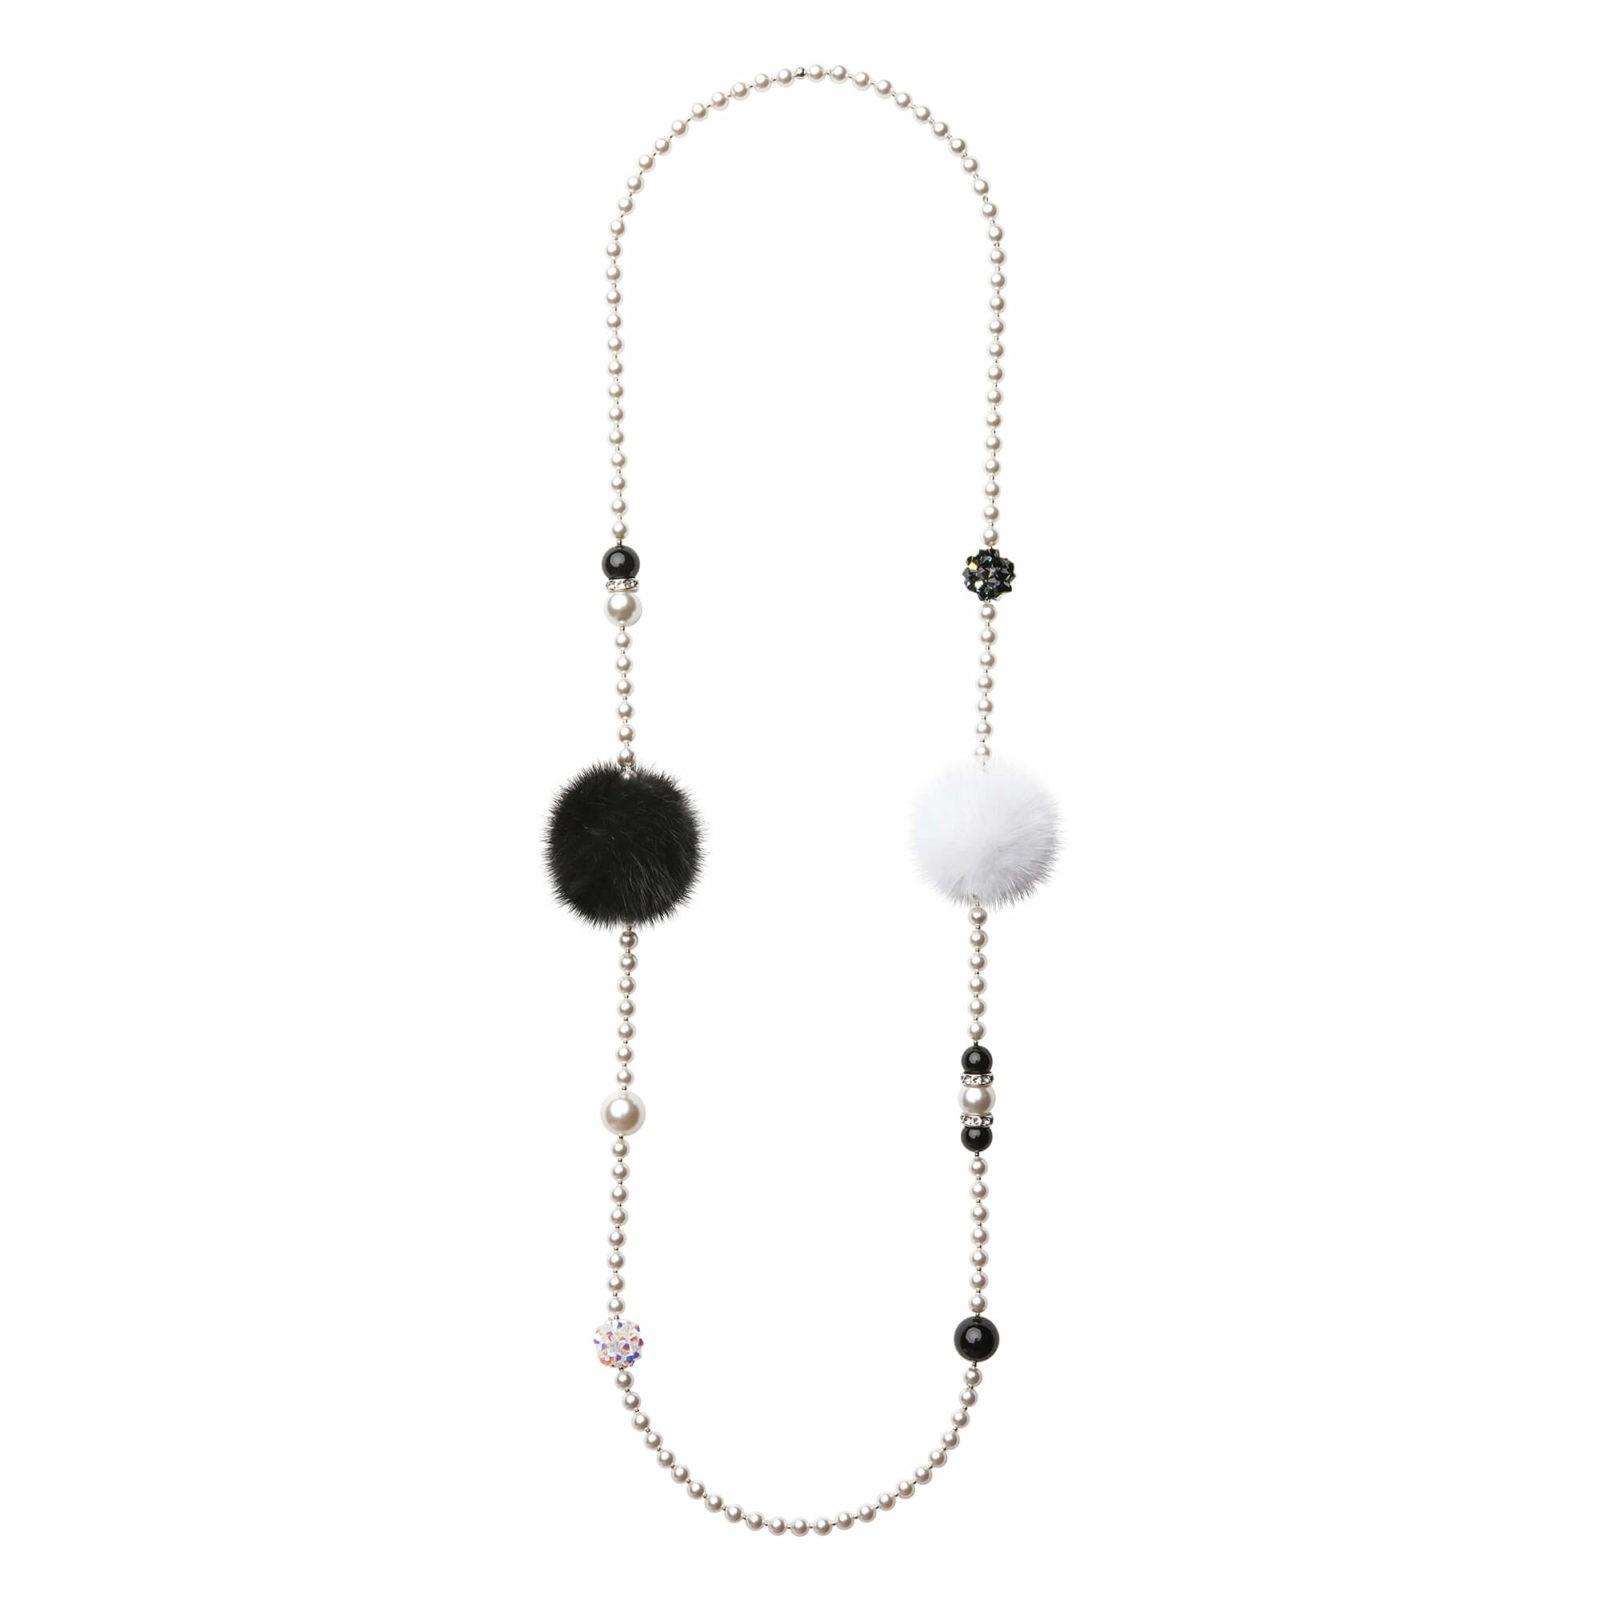 Recenzia na náhrdelník Noemi Duo